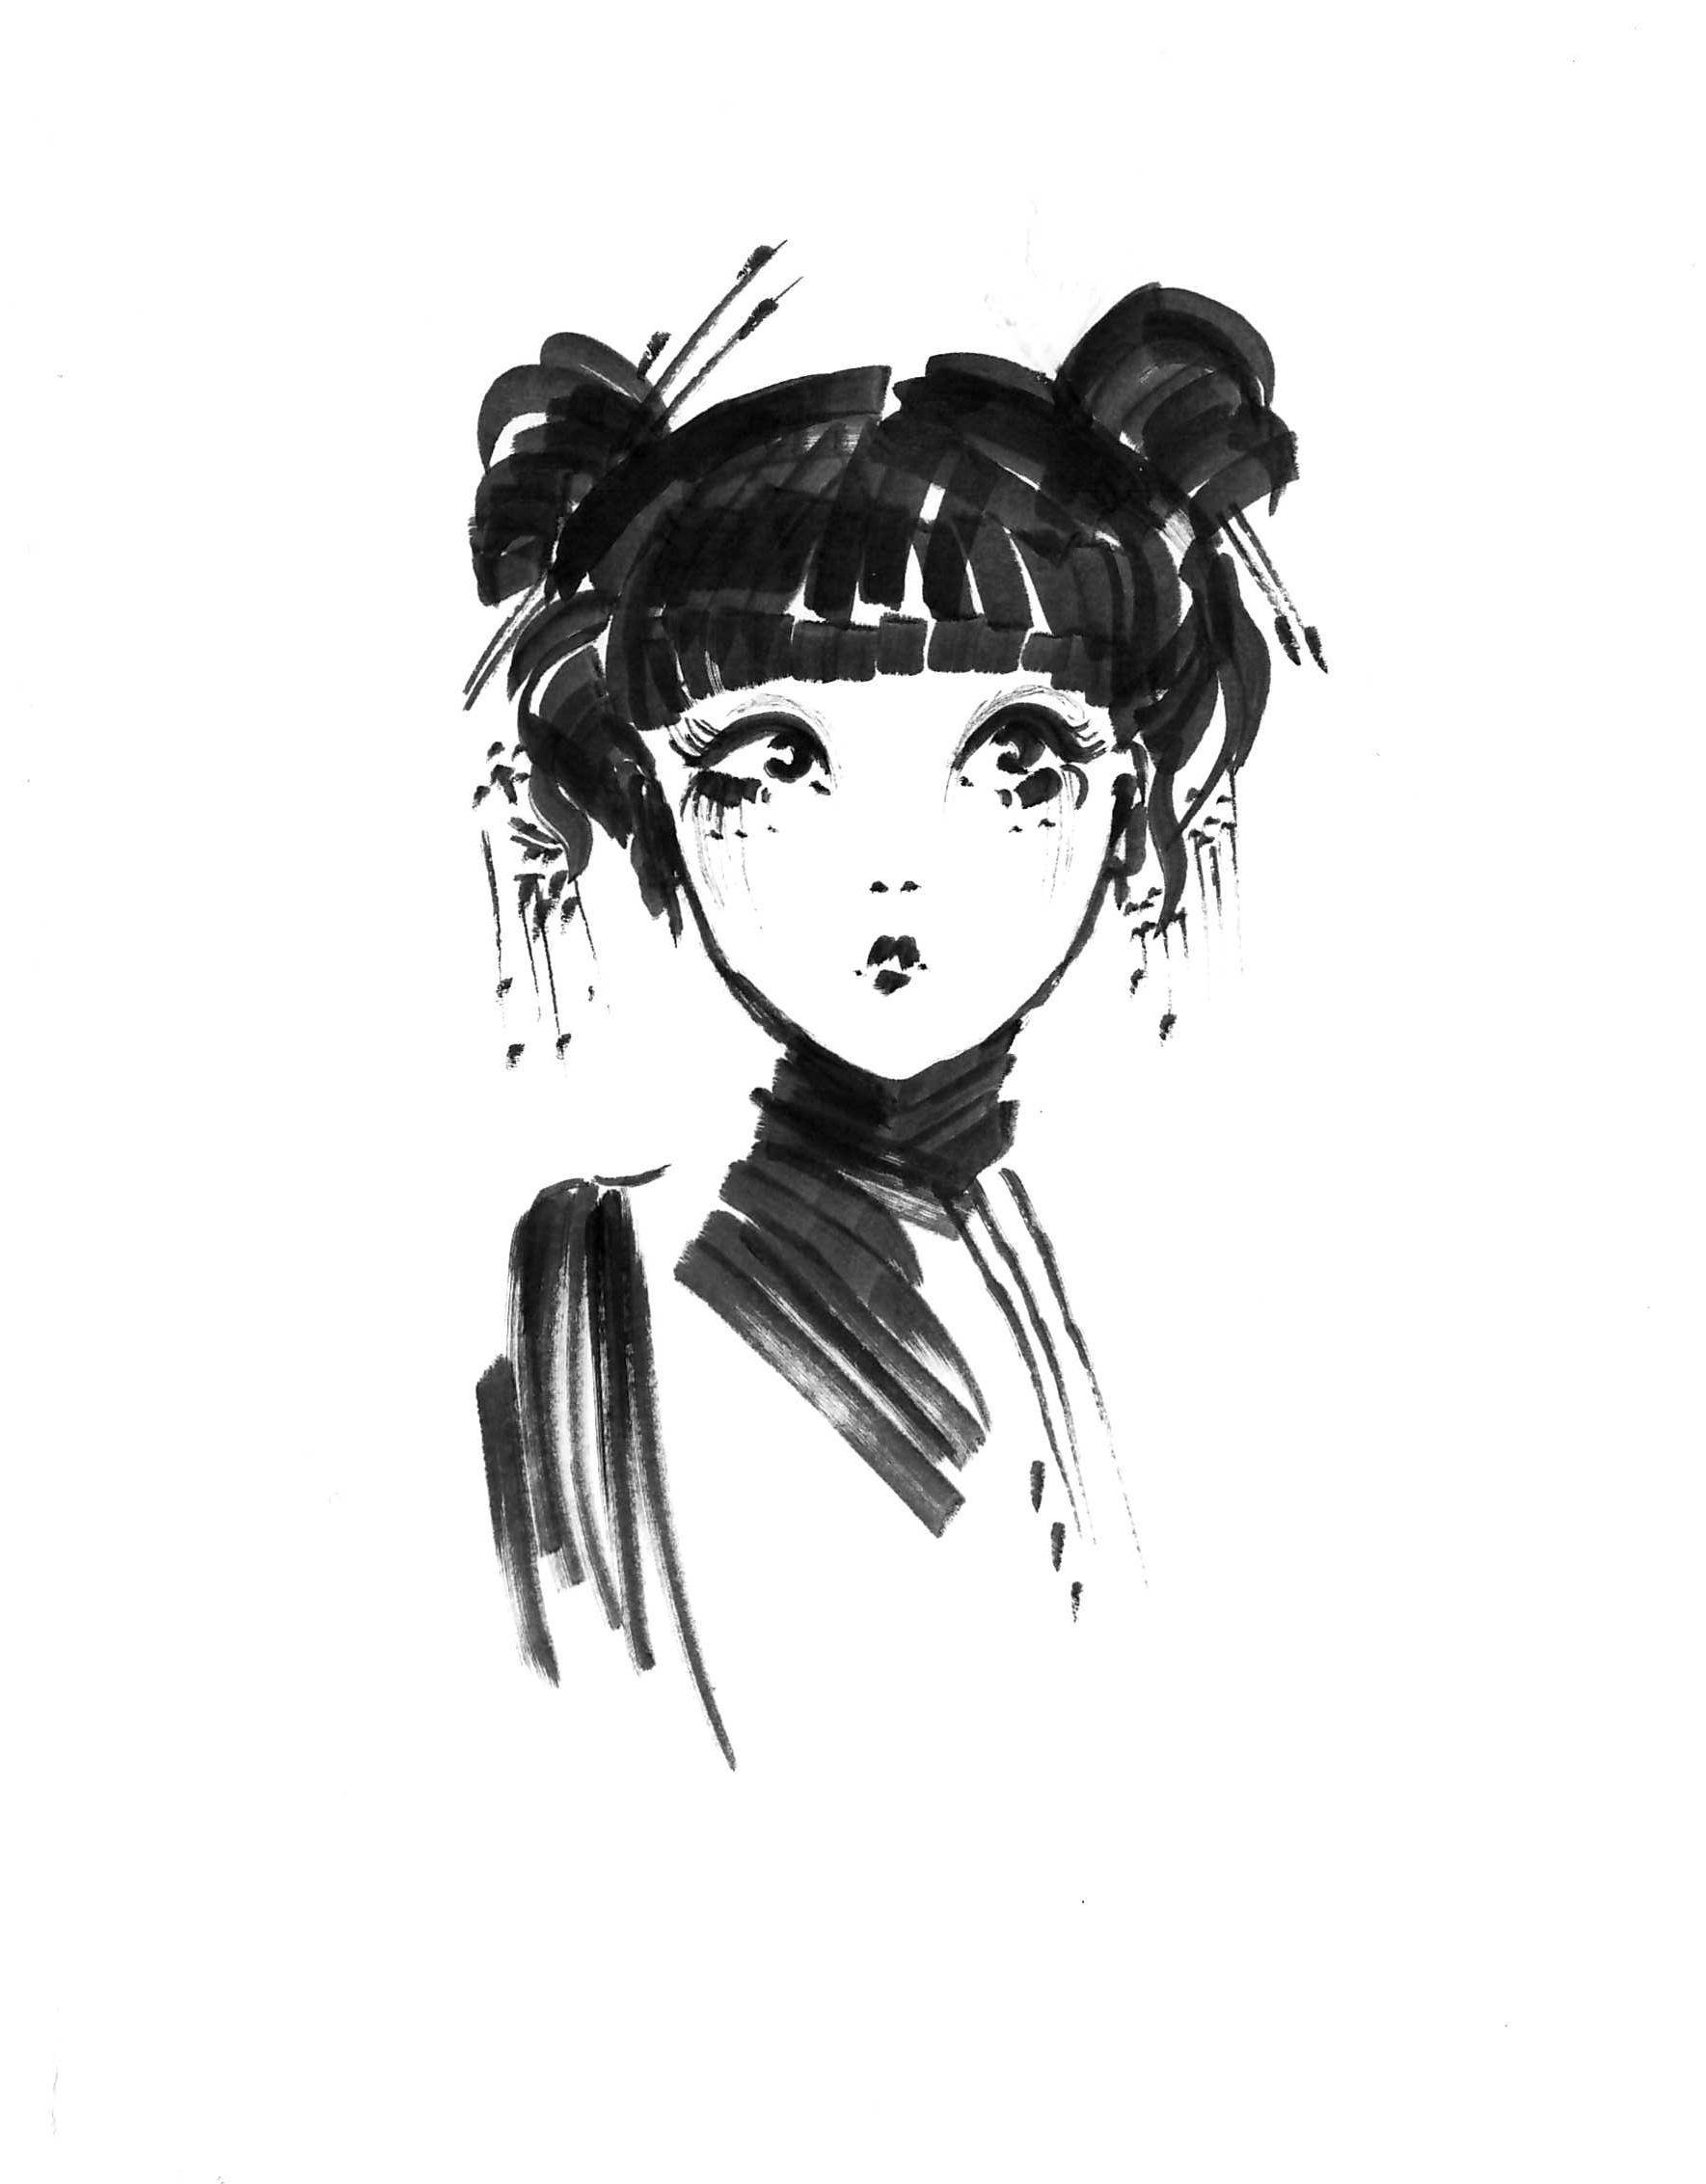 Fashion Illustration Draw Art Japanese Kimonogirl Faces Hairstyle Ink Sketch Japan Arty Art Japan Art Drawings